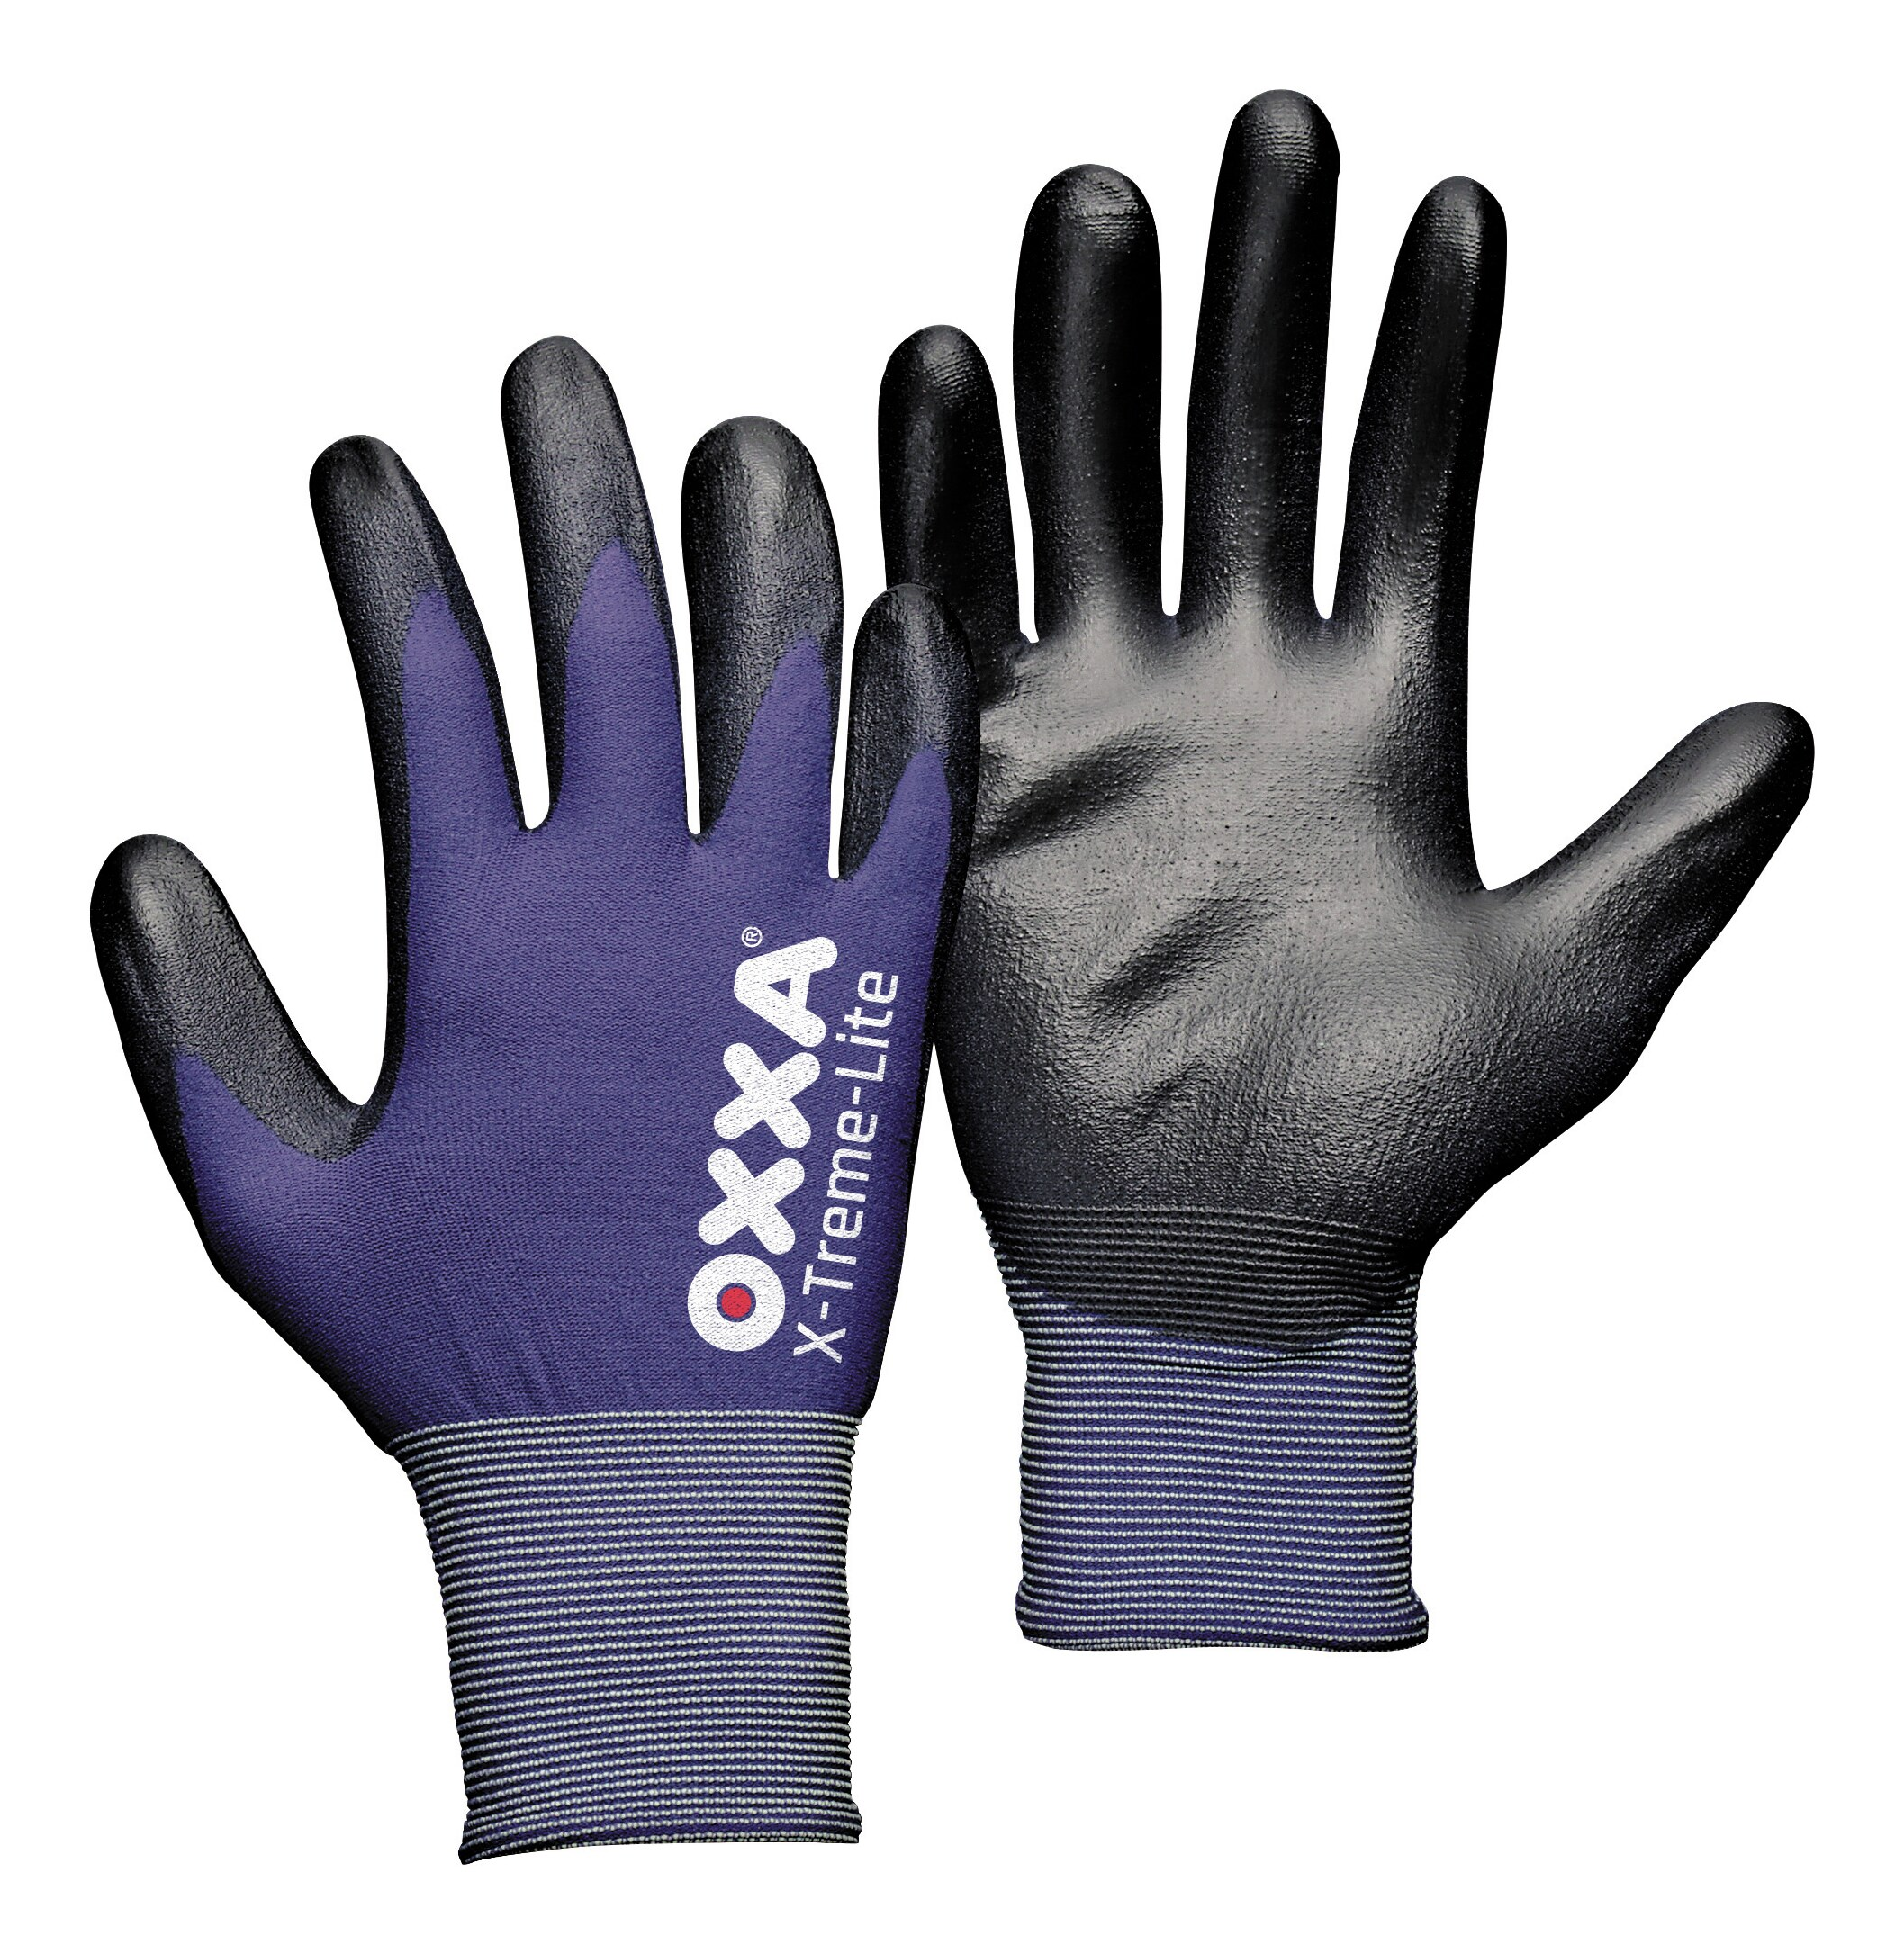 75b6ef10cb4d37 Oxxa Handschuh X-Treme-Lite PU, Größe 10 - 1.51.100.10 (VPE: 12 Paar)